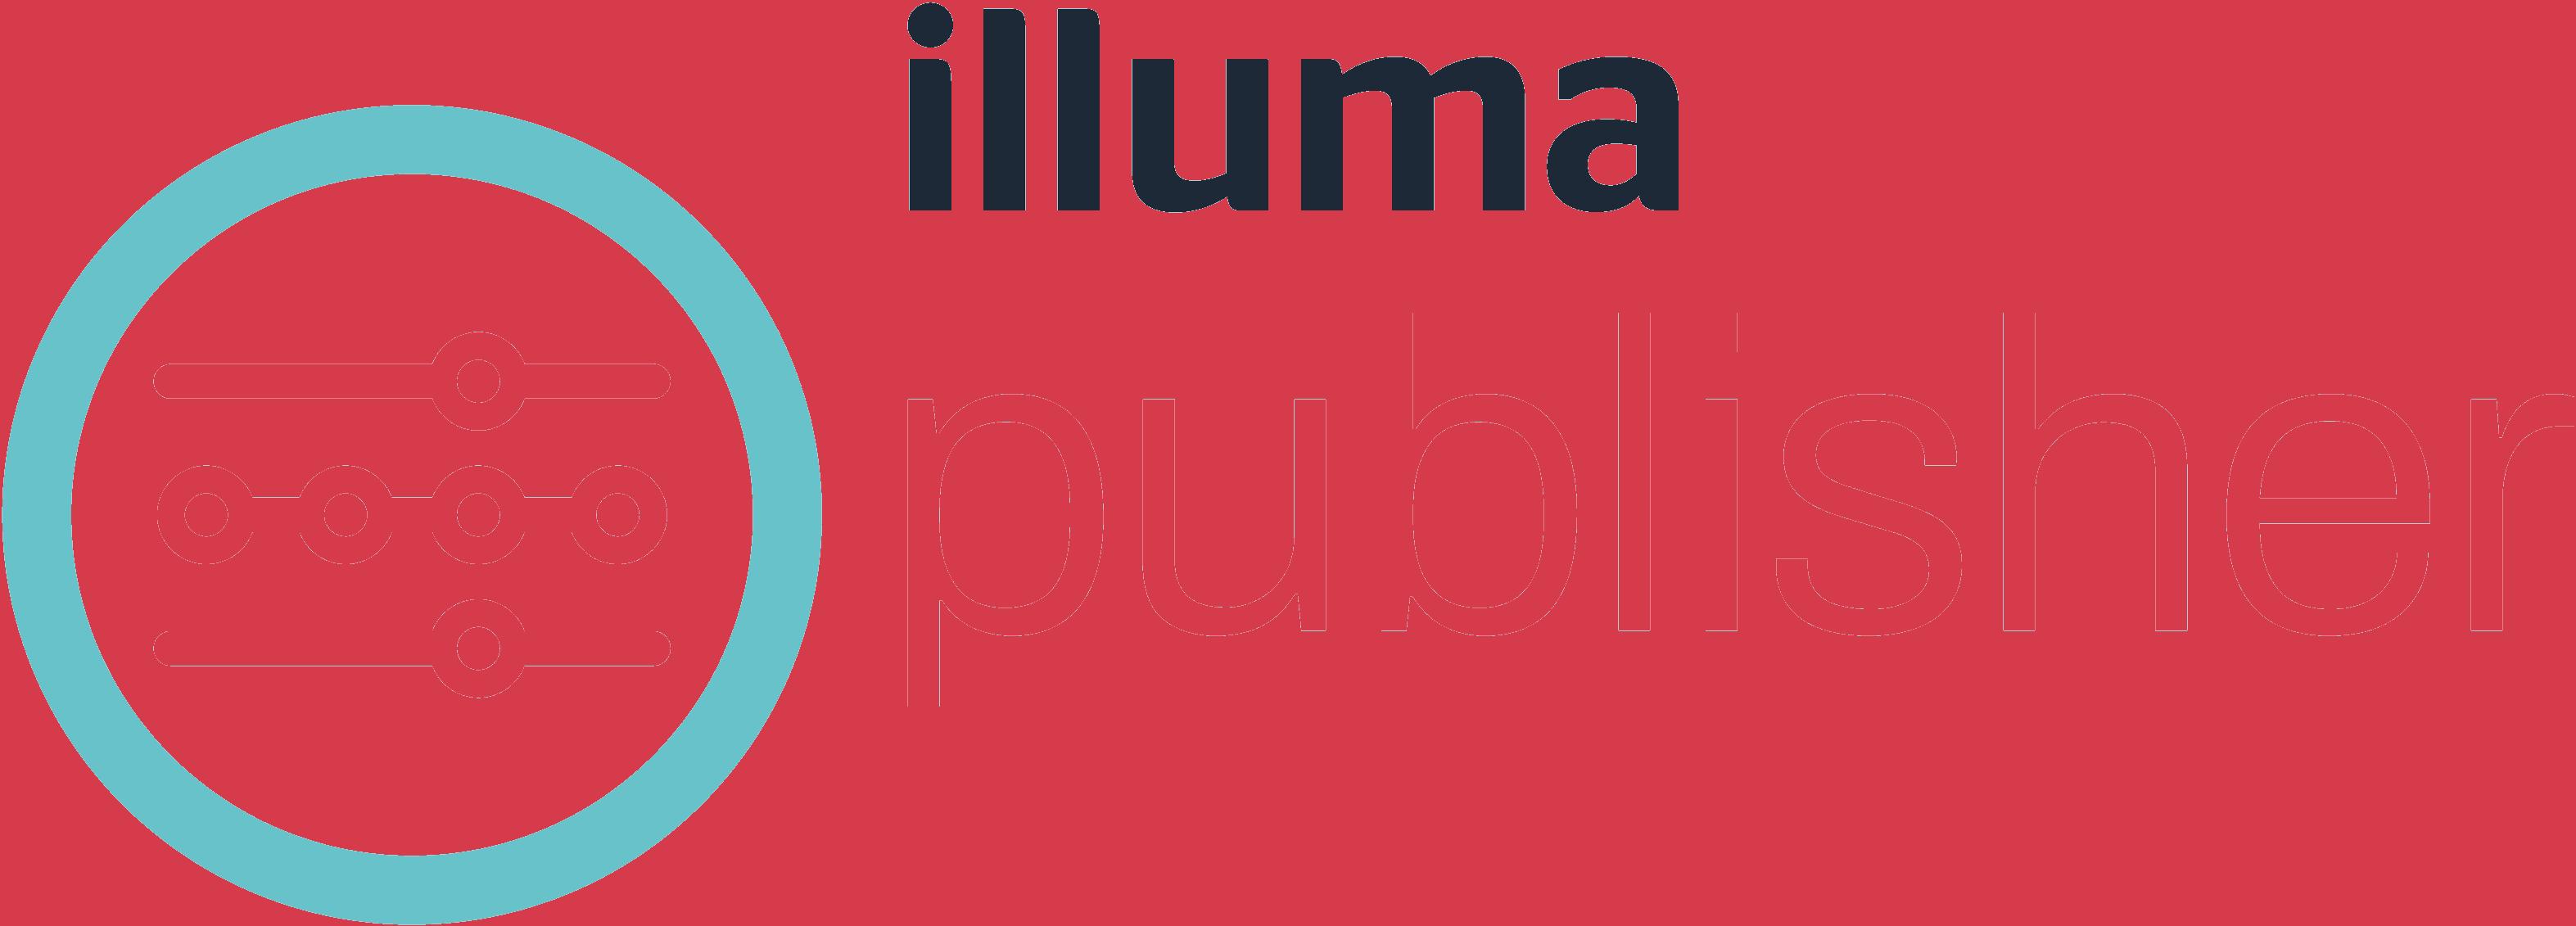 illuma publisher logo